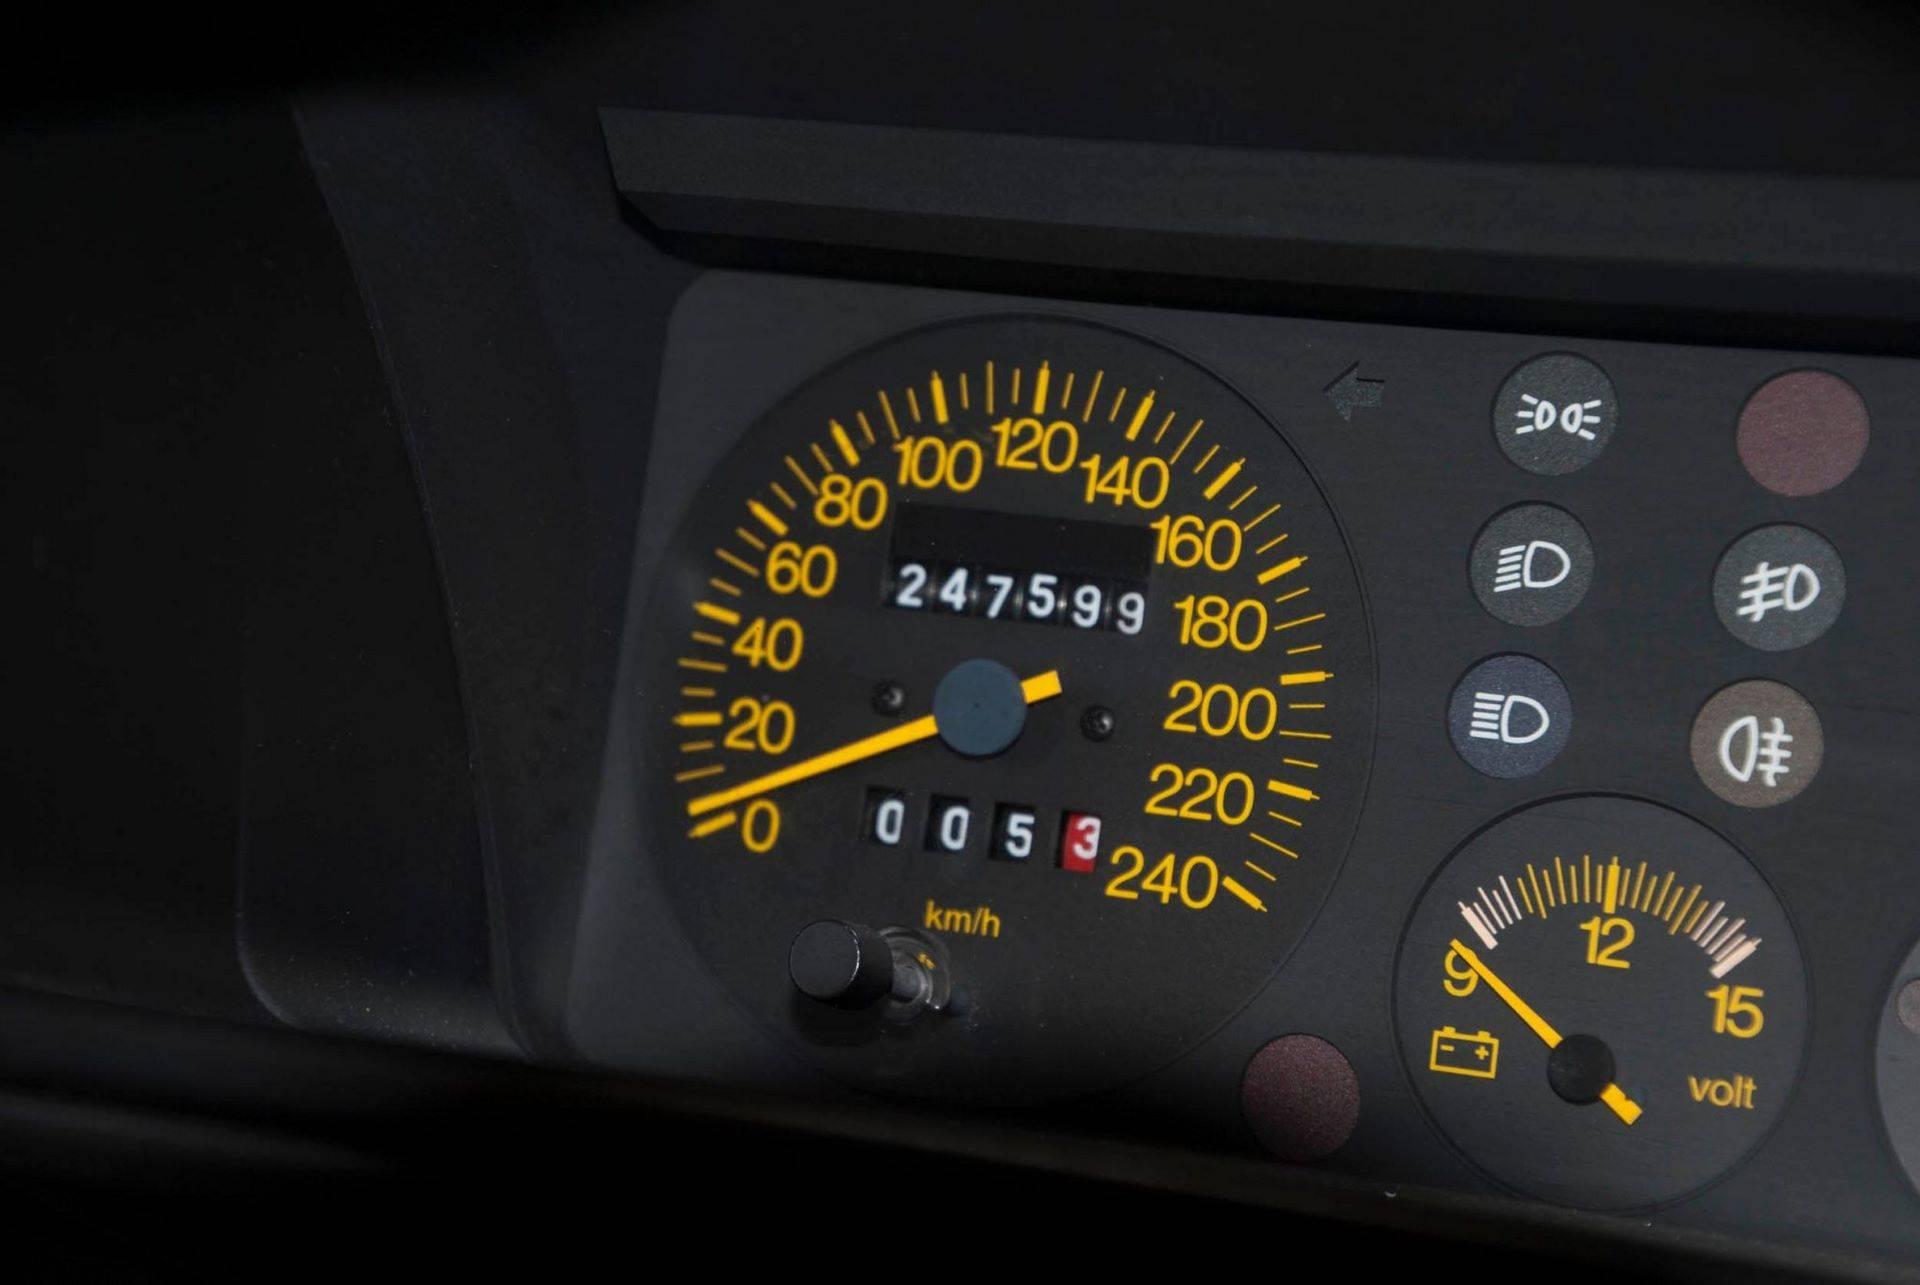 Lancia-Delta-Integrale-8V-1989-16